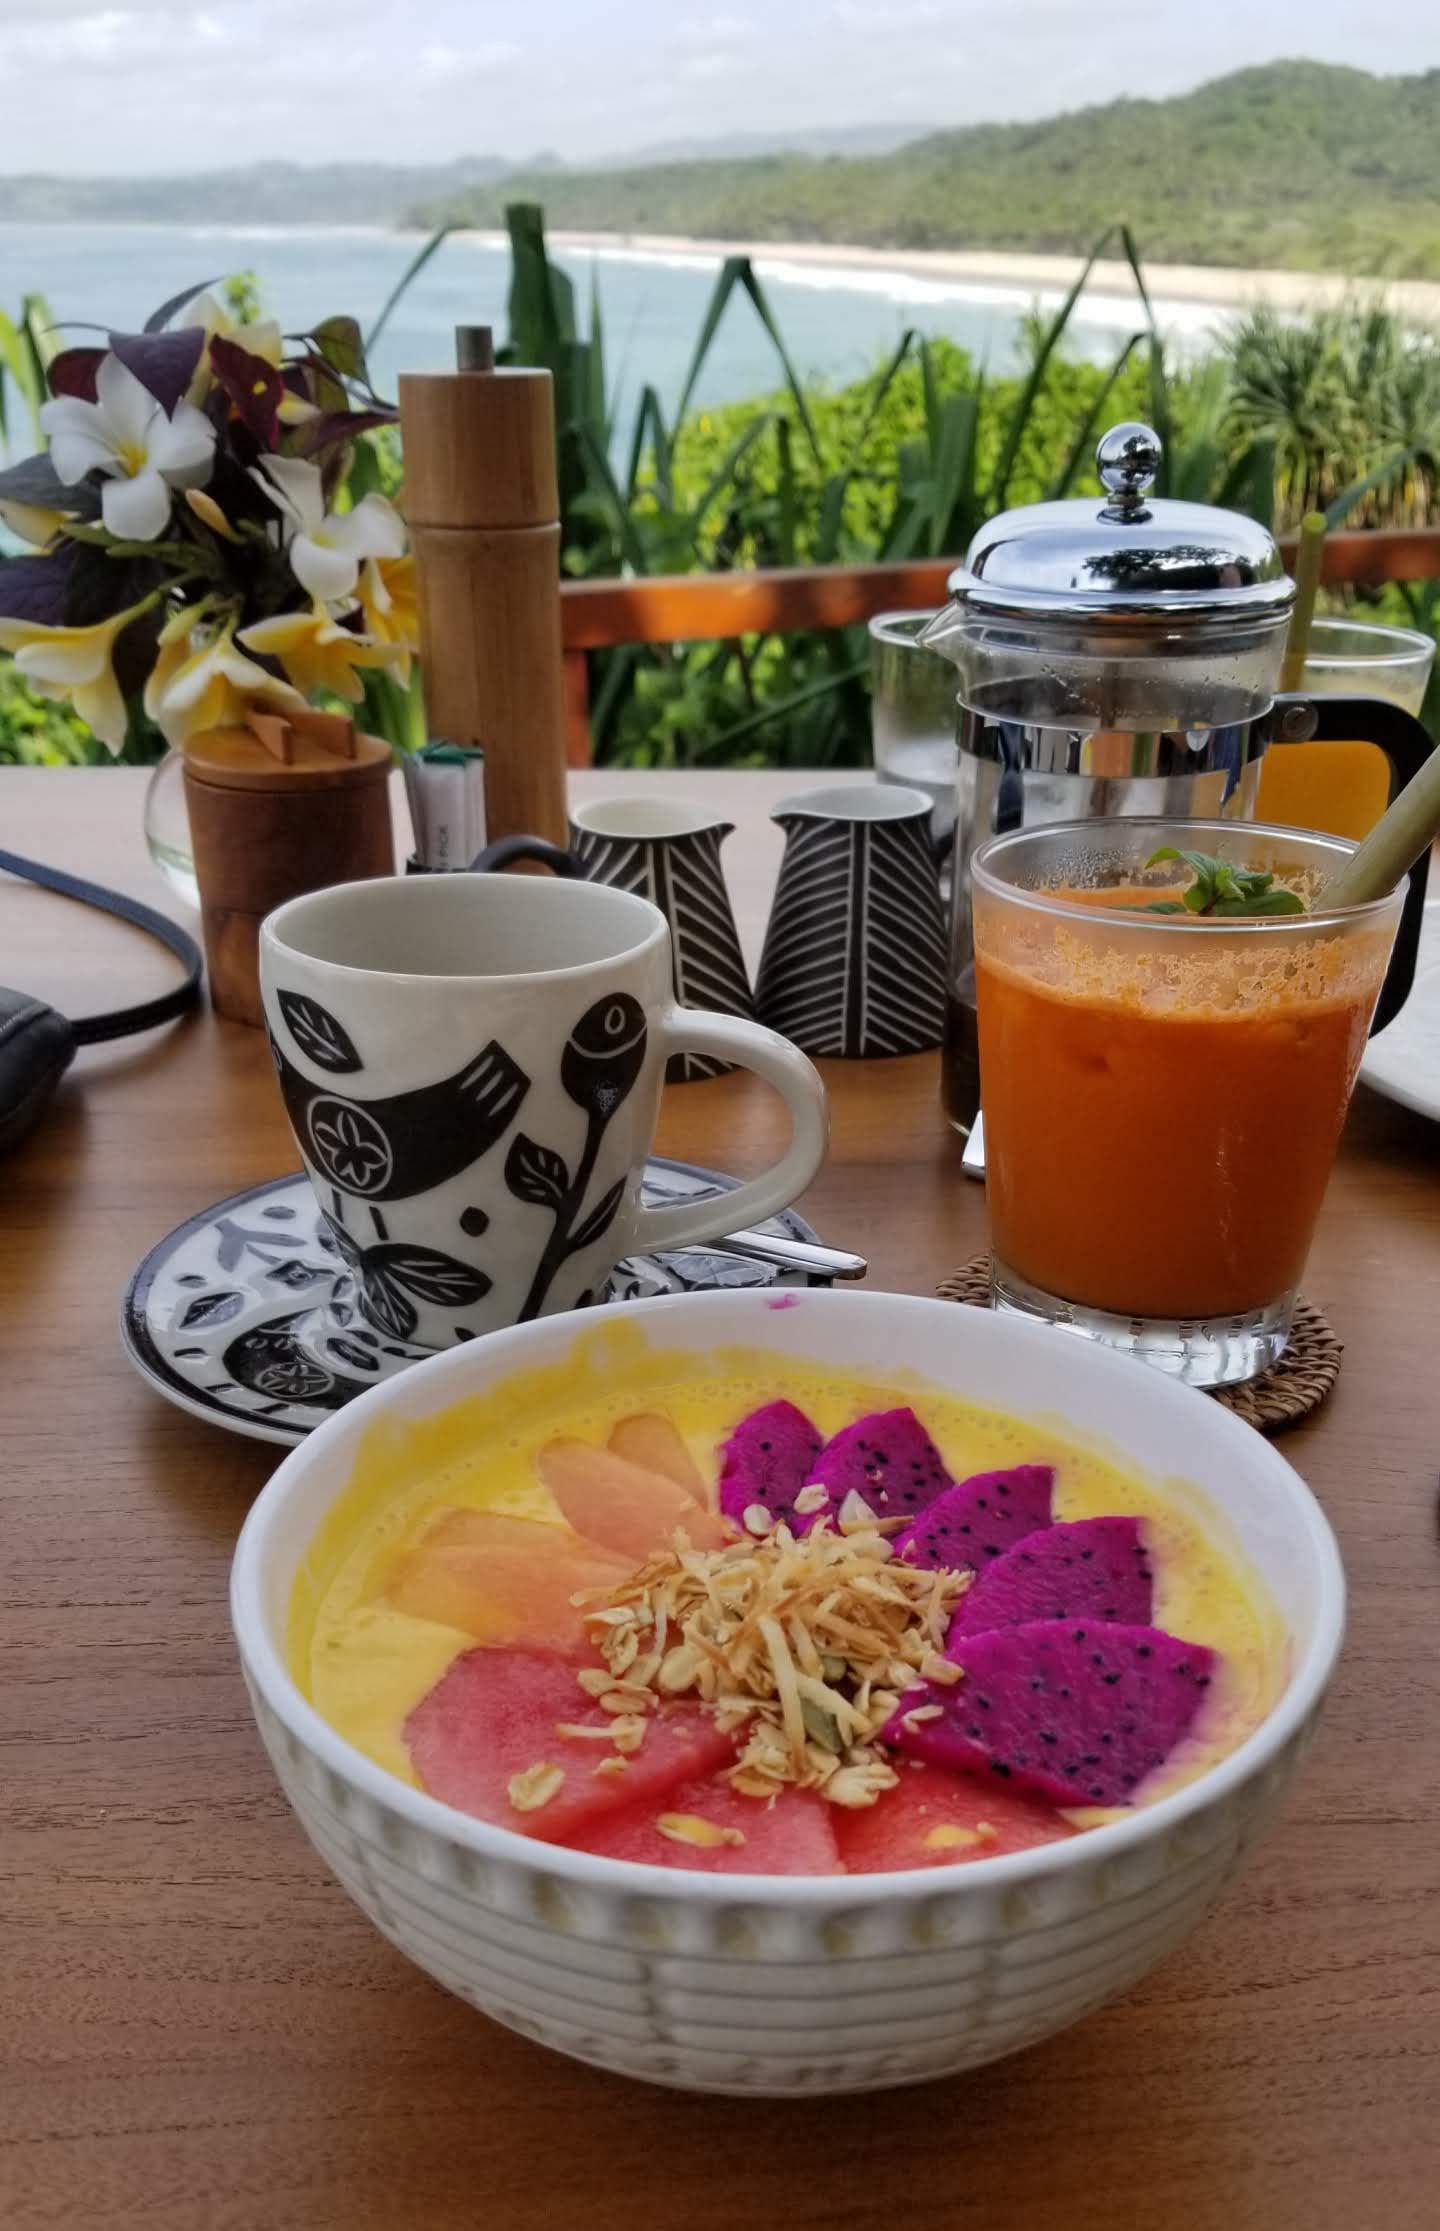 Breakfast smoothie bowl, ginger turmeric juice, and Sumbanese coffee